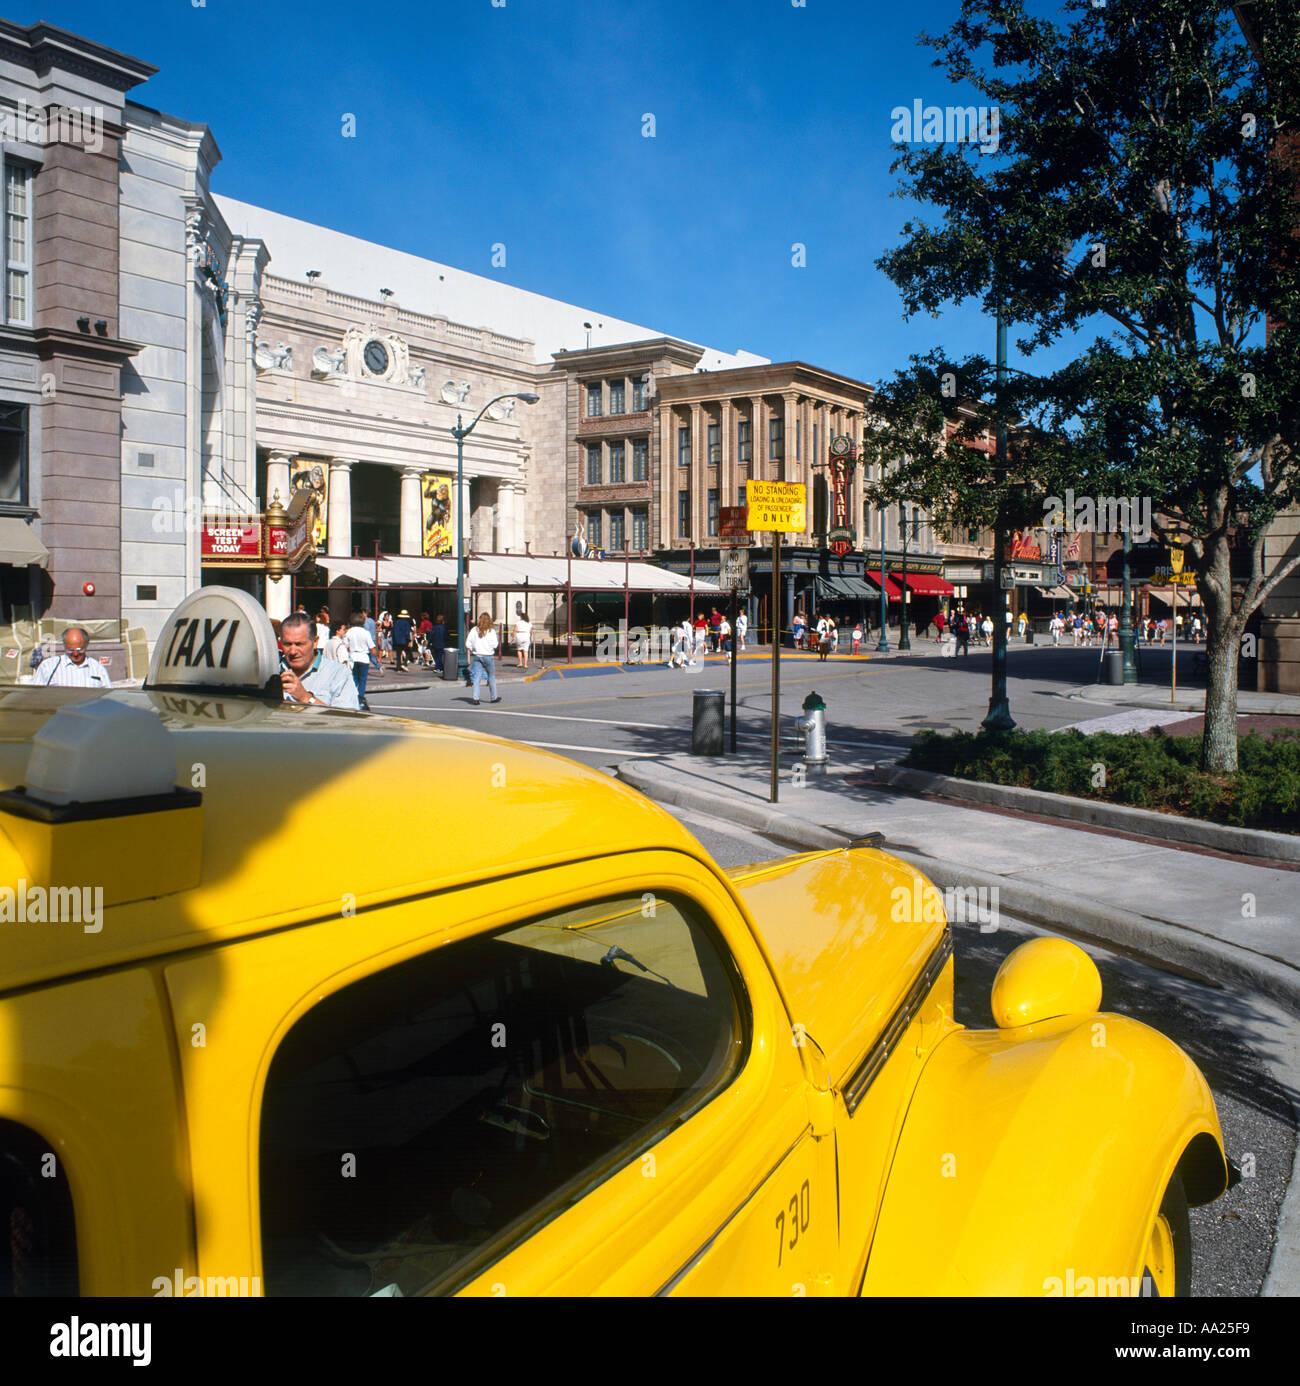 Universal Studios, Orlando, Florida, USA - Stock Image